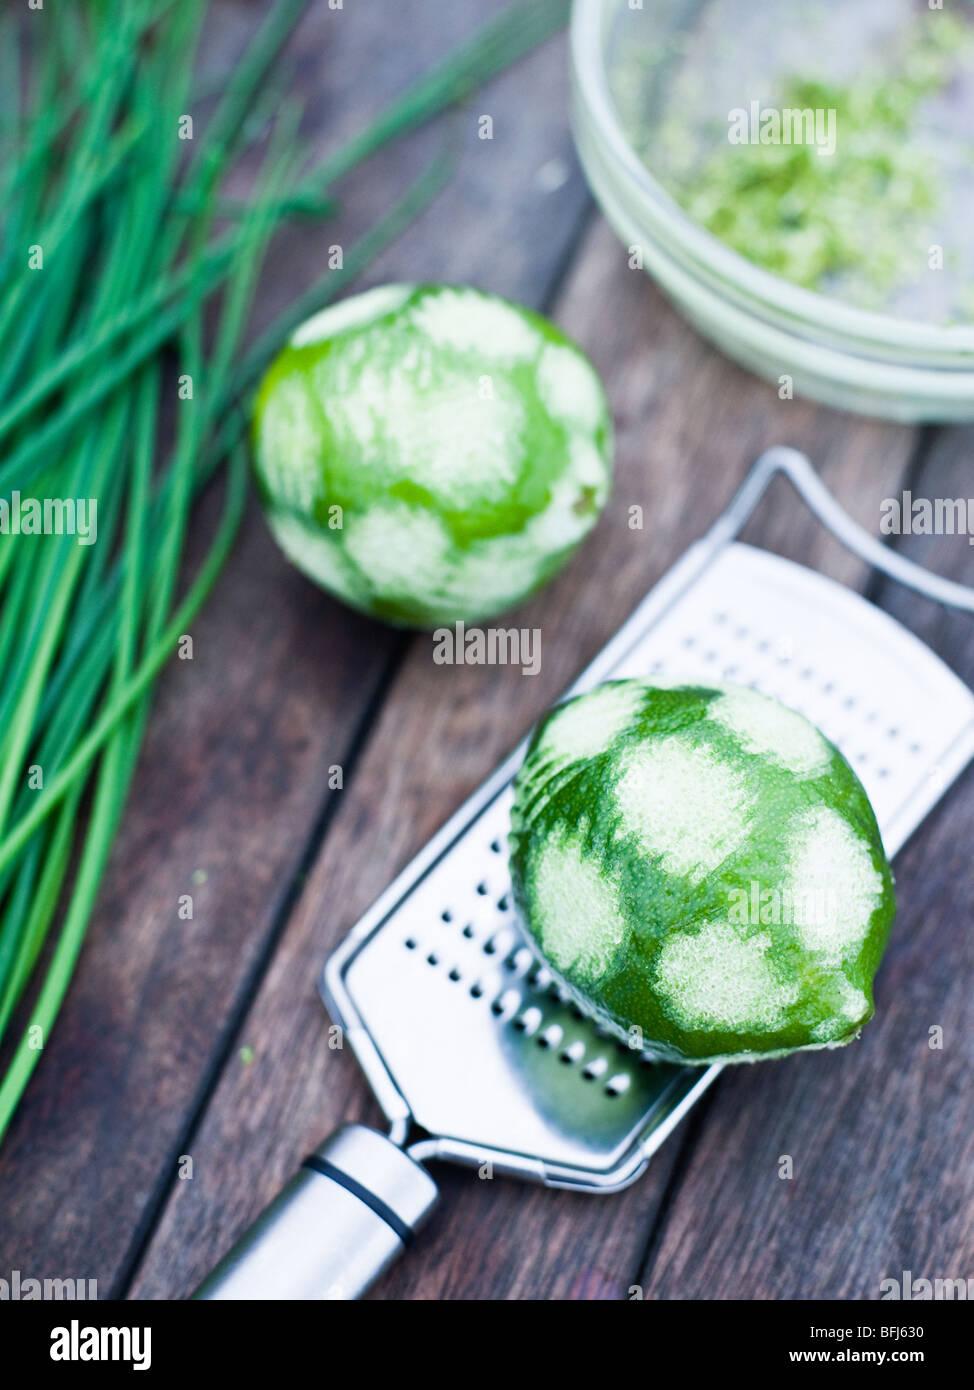 Lime, close-up, Svezia. Immagini Stock